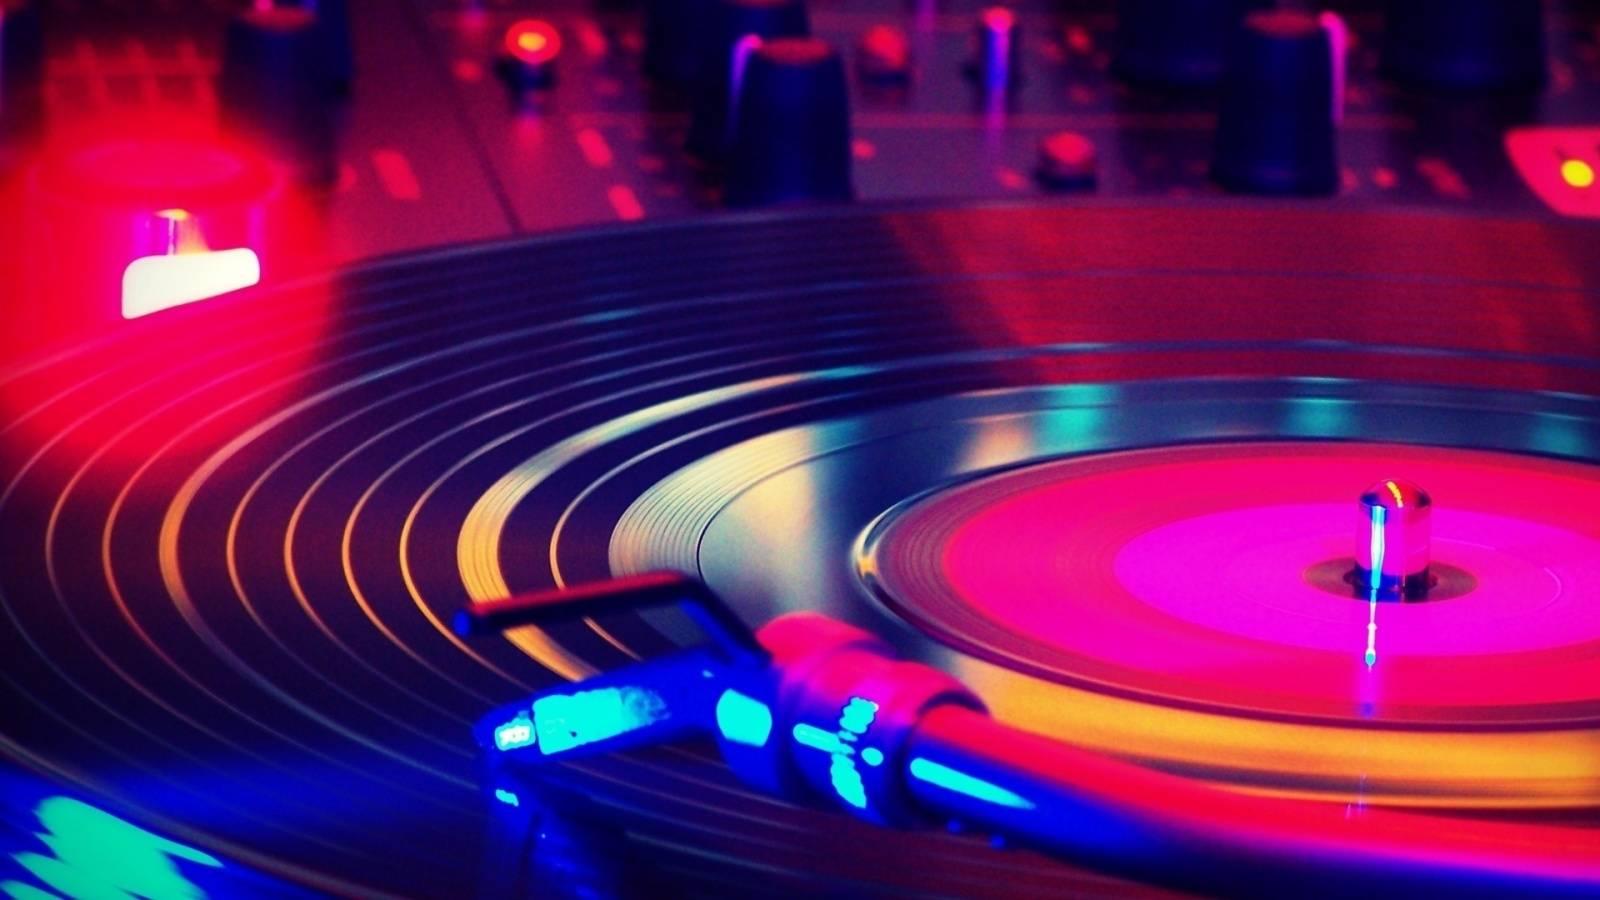 vinylplaying1600x900-25f33e54723f74f6d90a0c86eab60cec.jpg